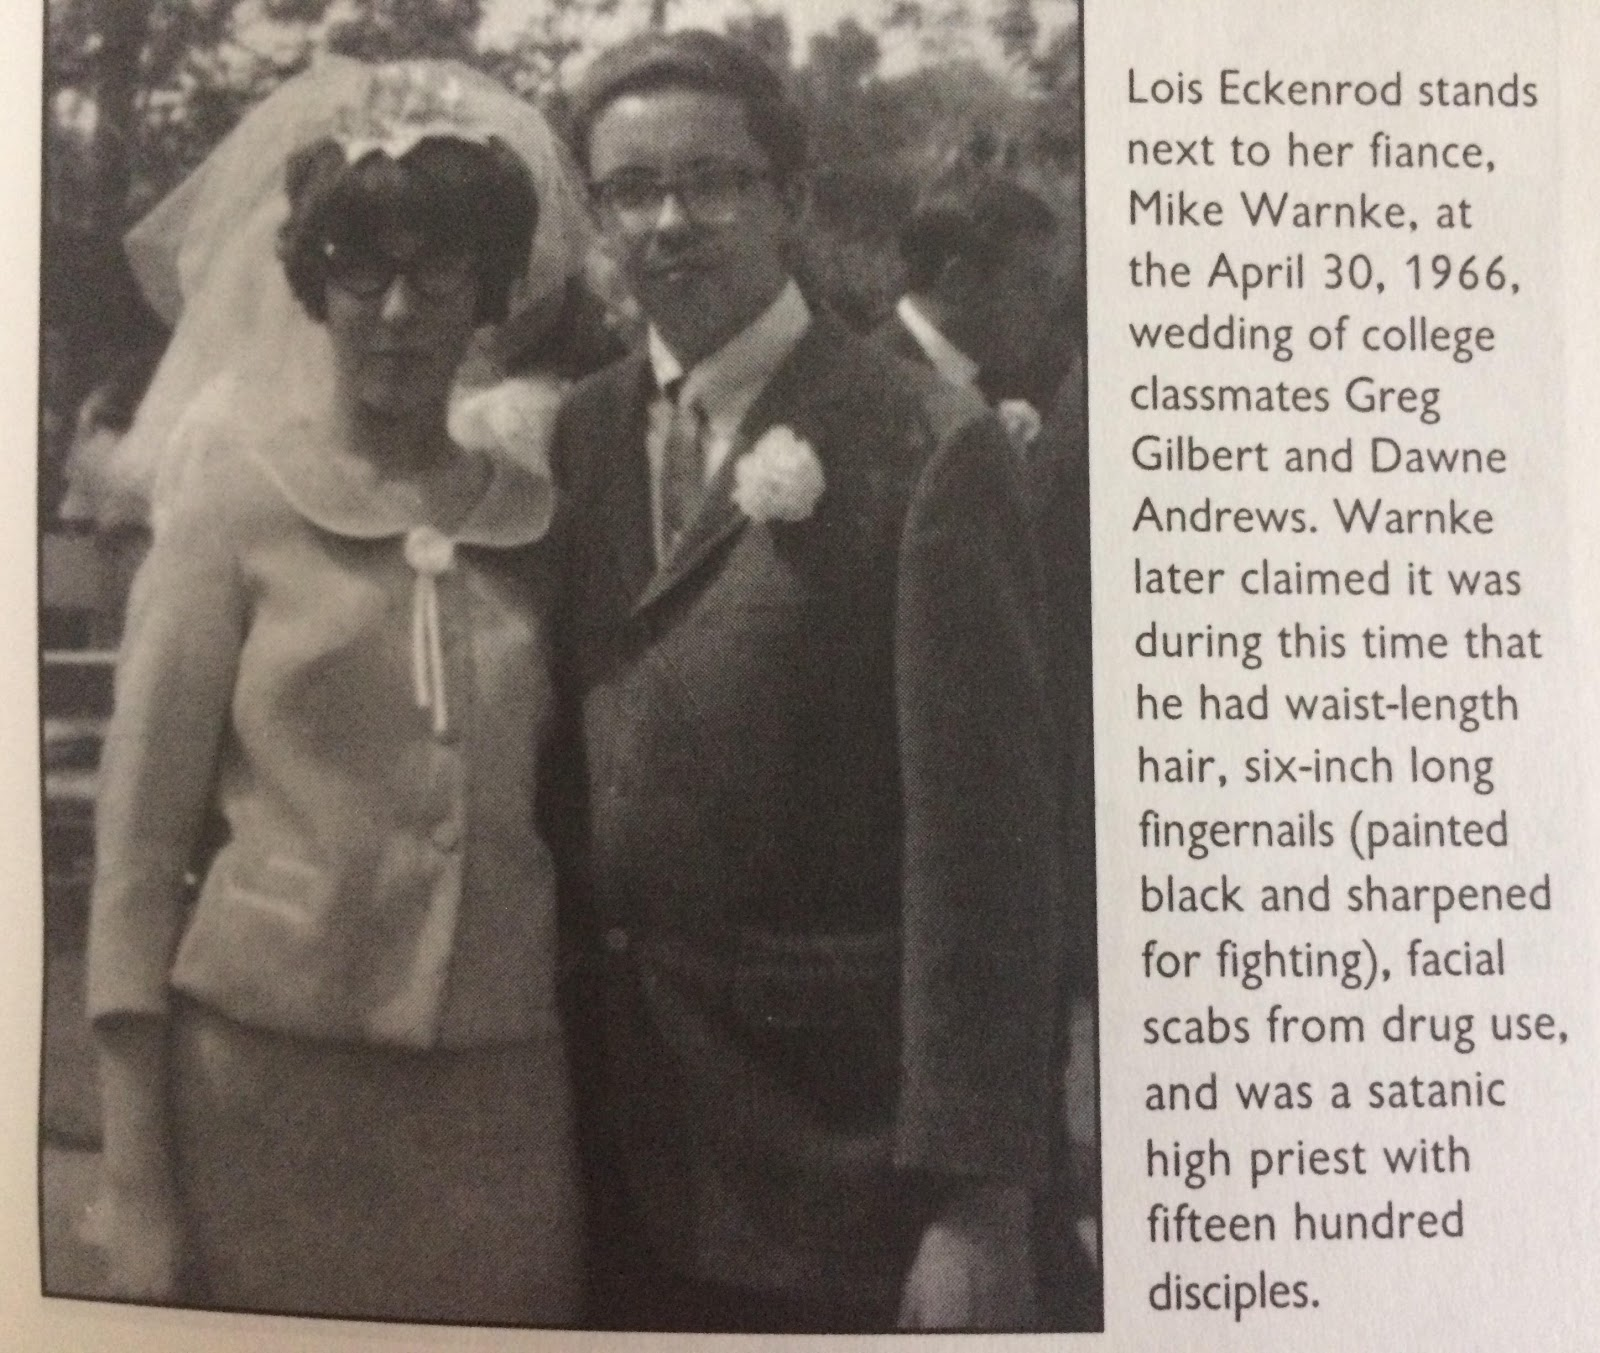 Lois - the forgotten fiancee